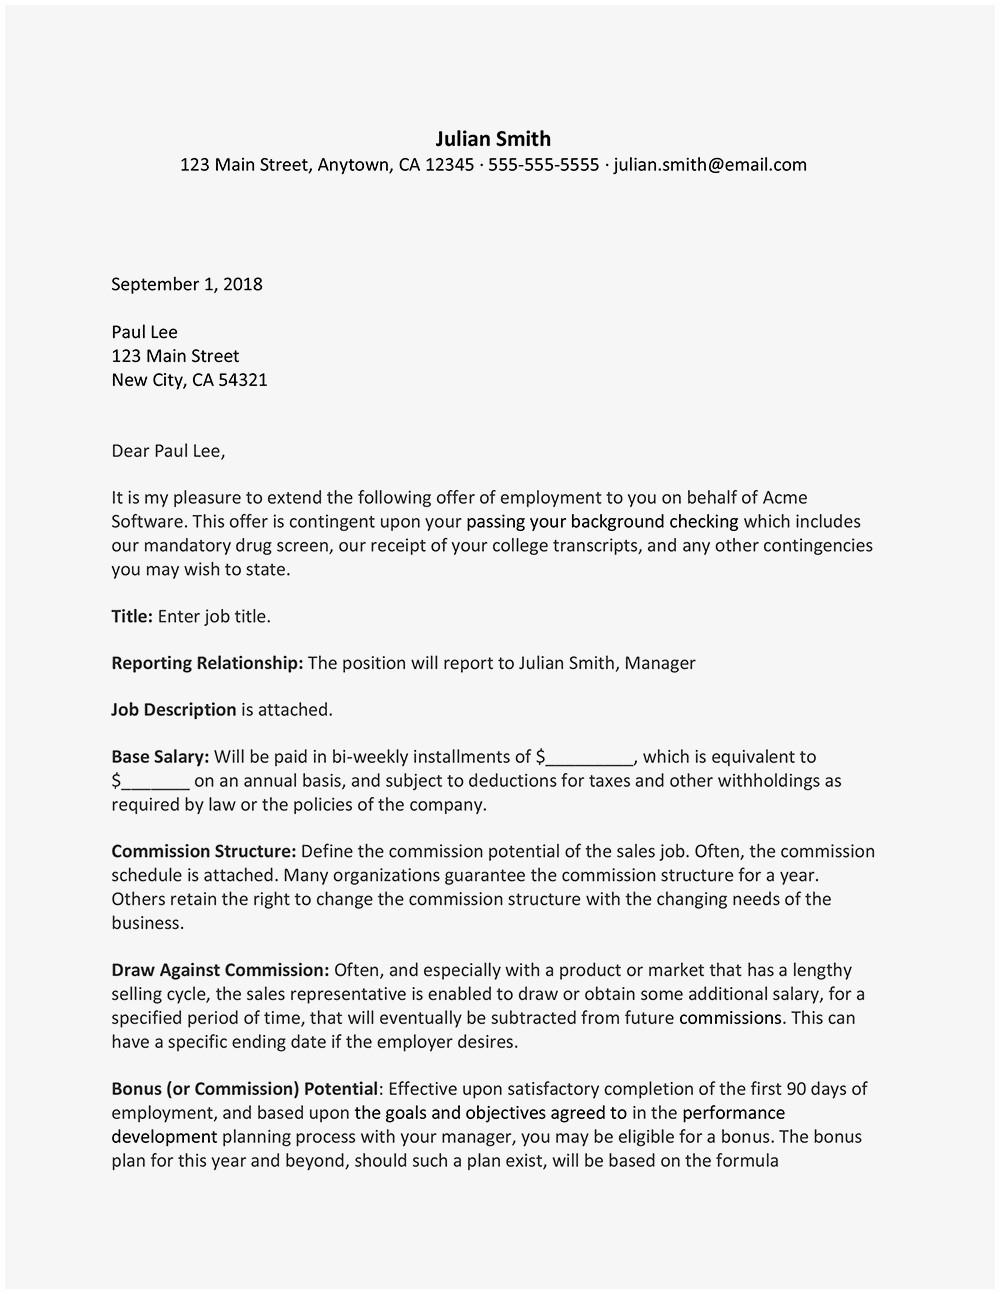 New Manufacturer Representative Agreement Template For Legal Representation Agreement Template 10 P Contract Template Agreement Quote Sales Representative